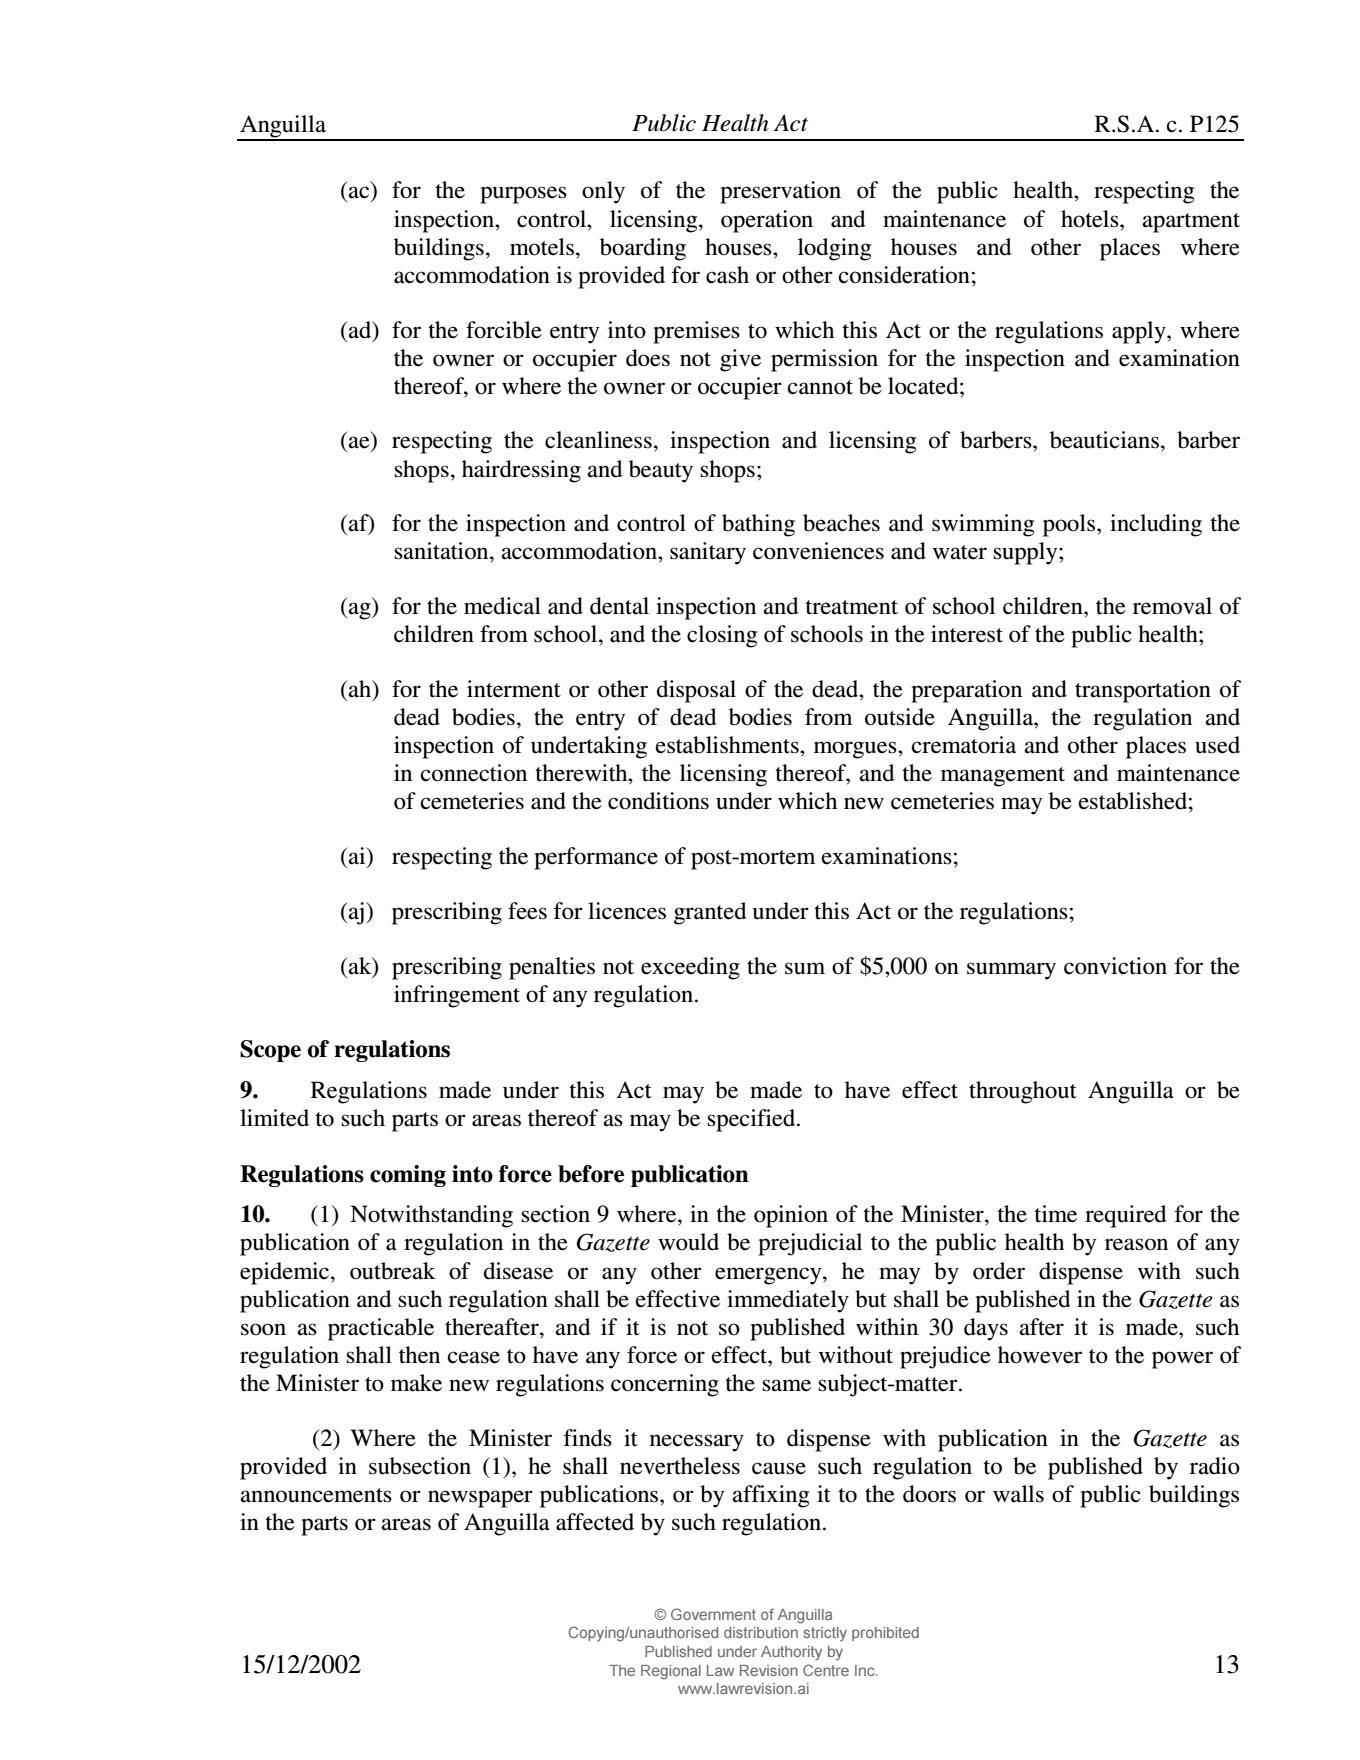 Index of /laws/P125-00-Public Health Act/docs